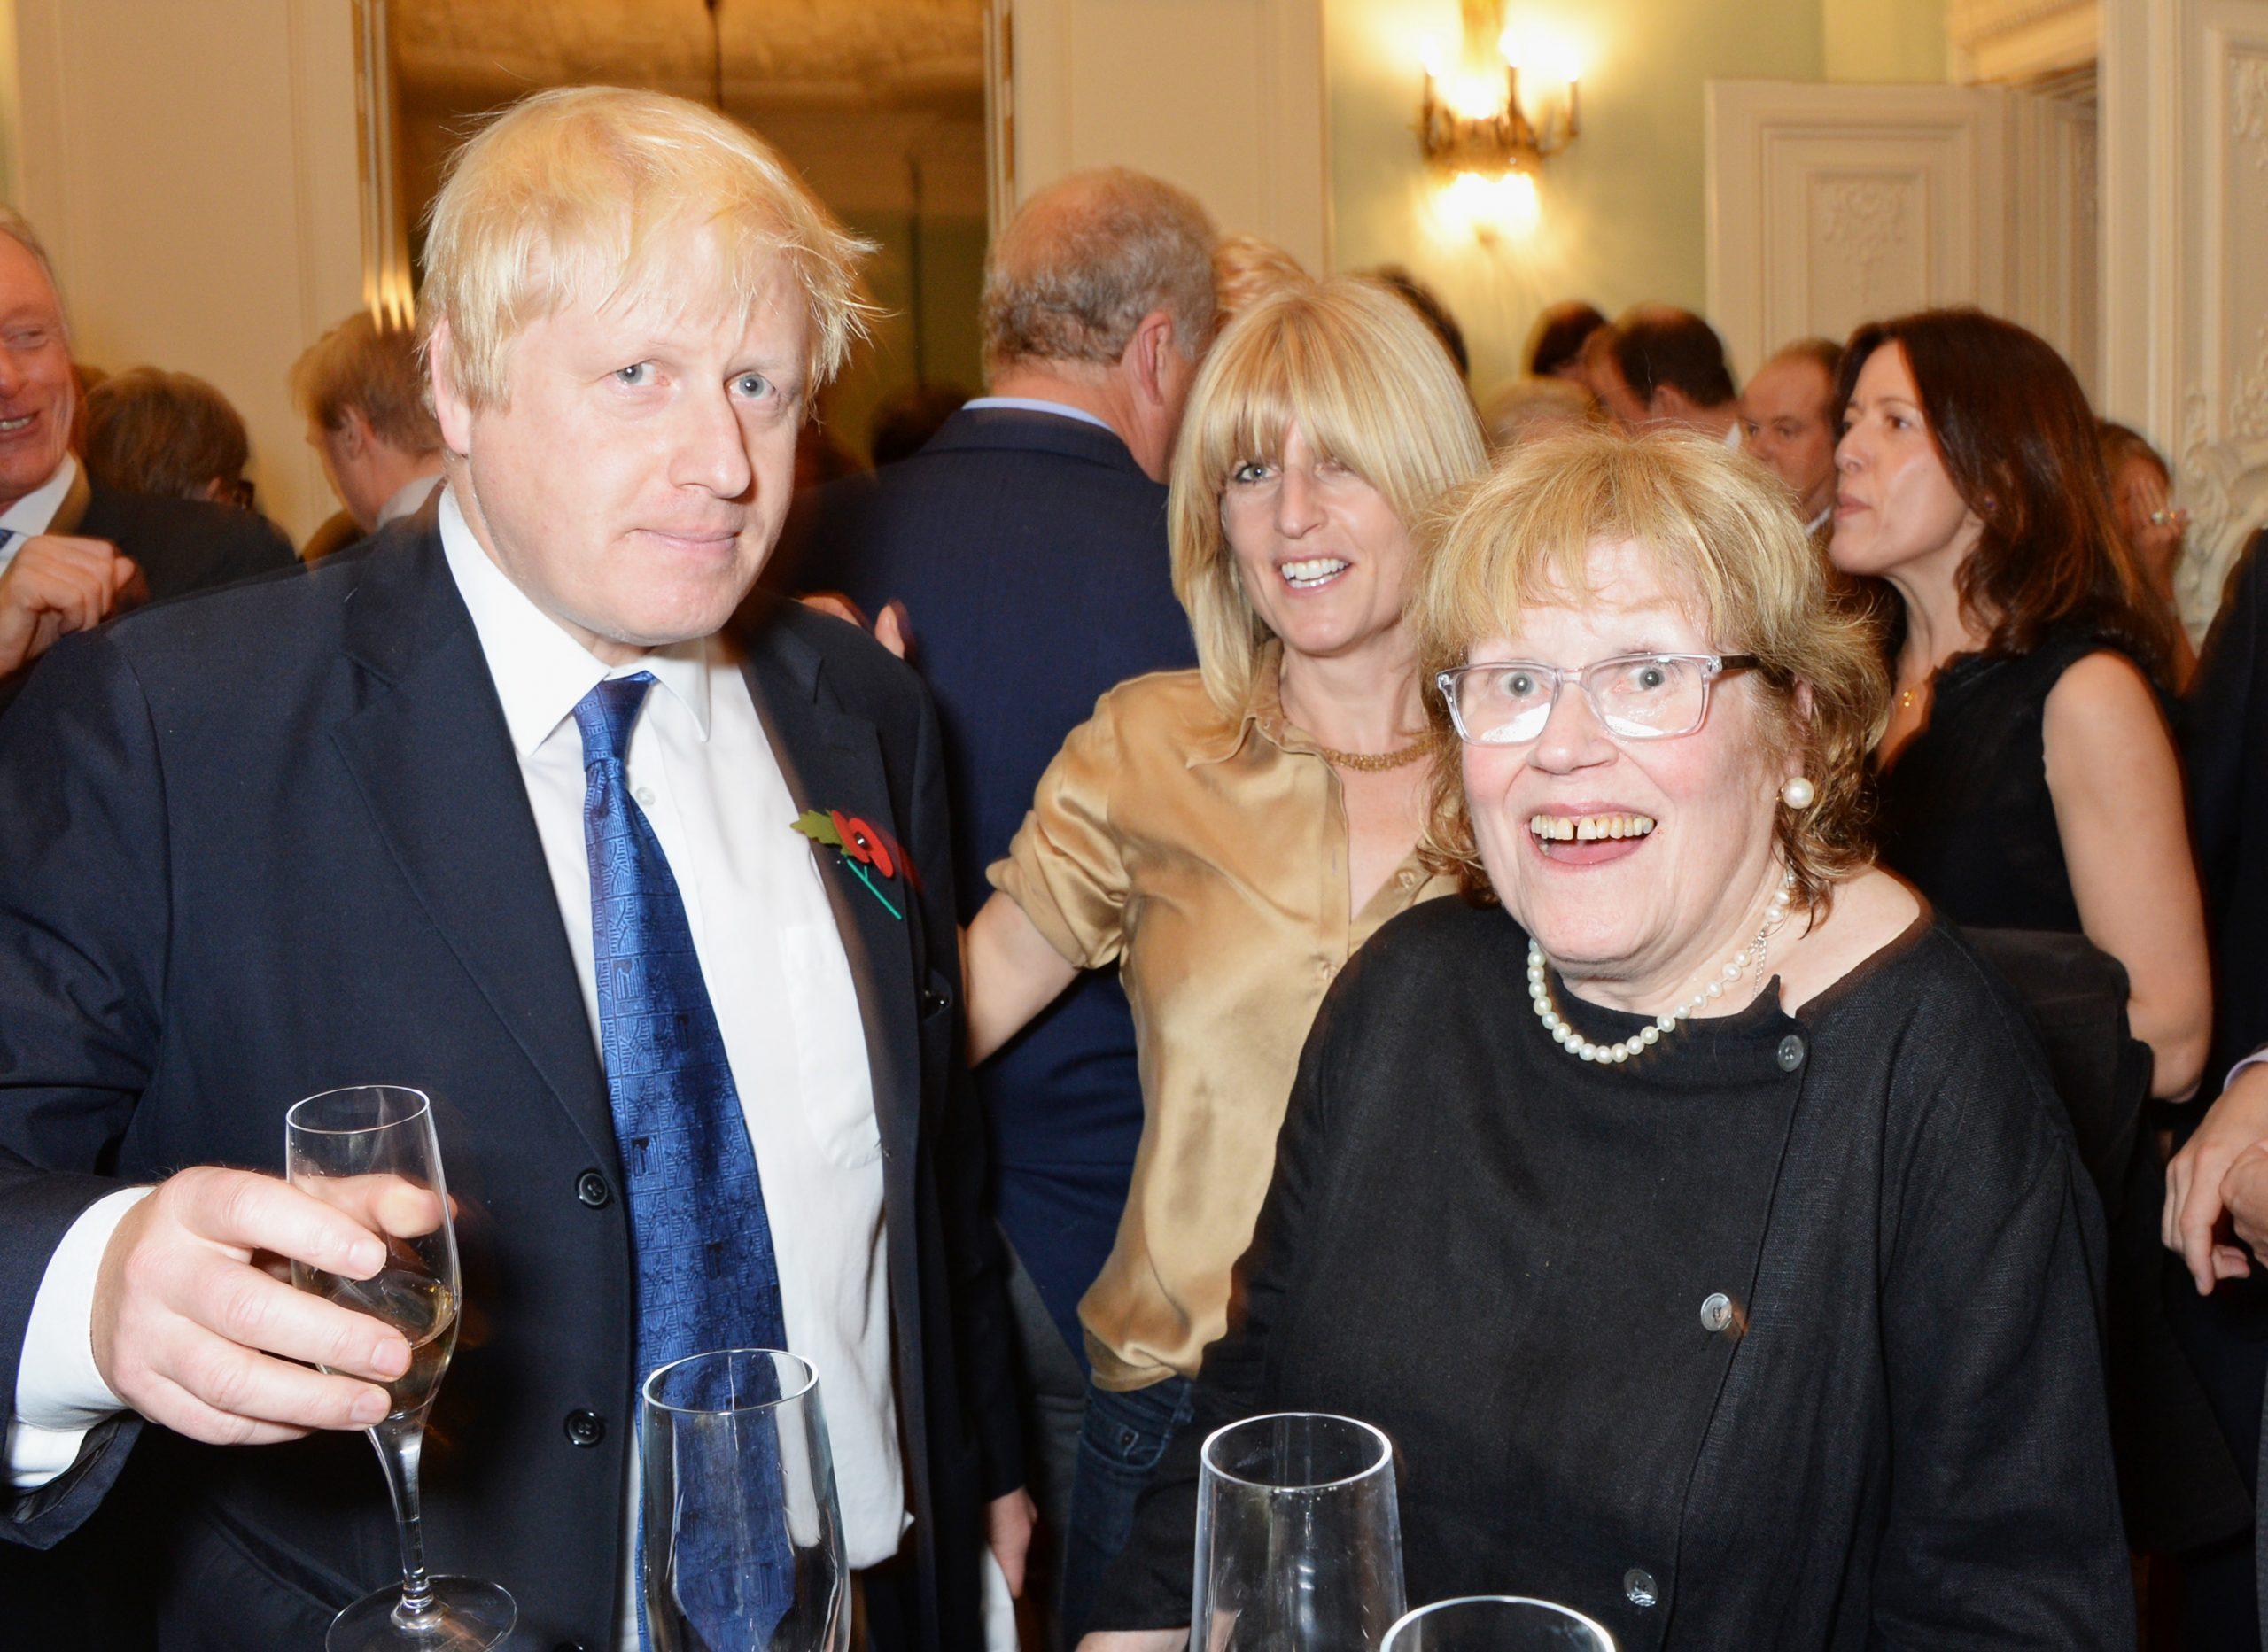 Boris Johnson, Rachel Johnson et leur maman Charlotte Johnson Wahl.